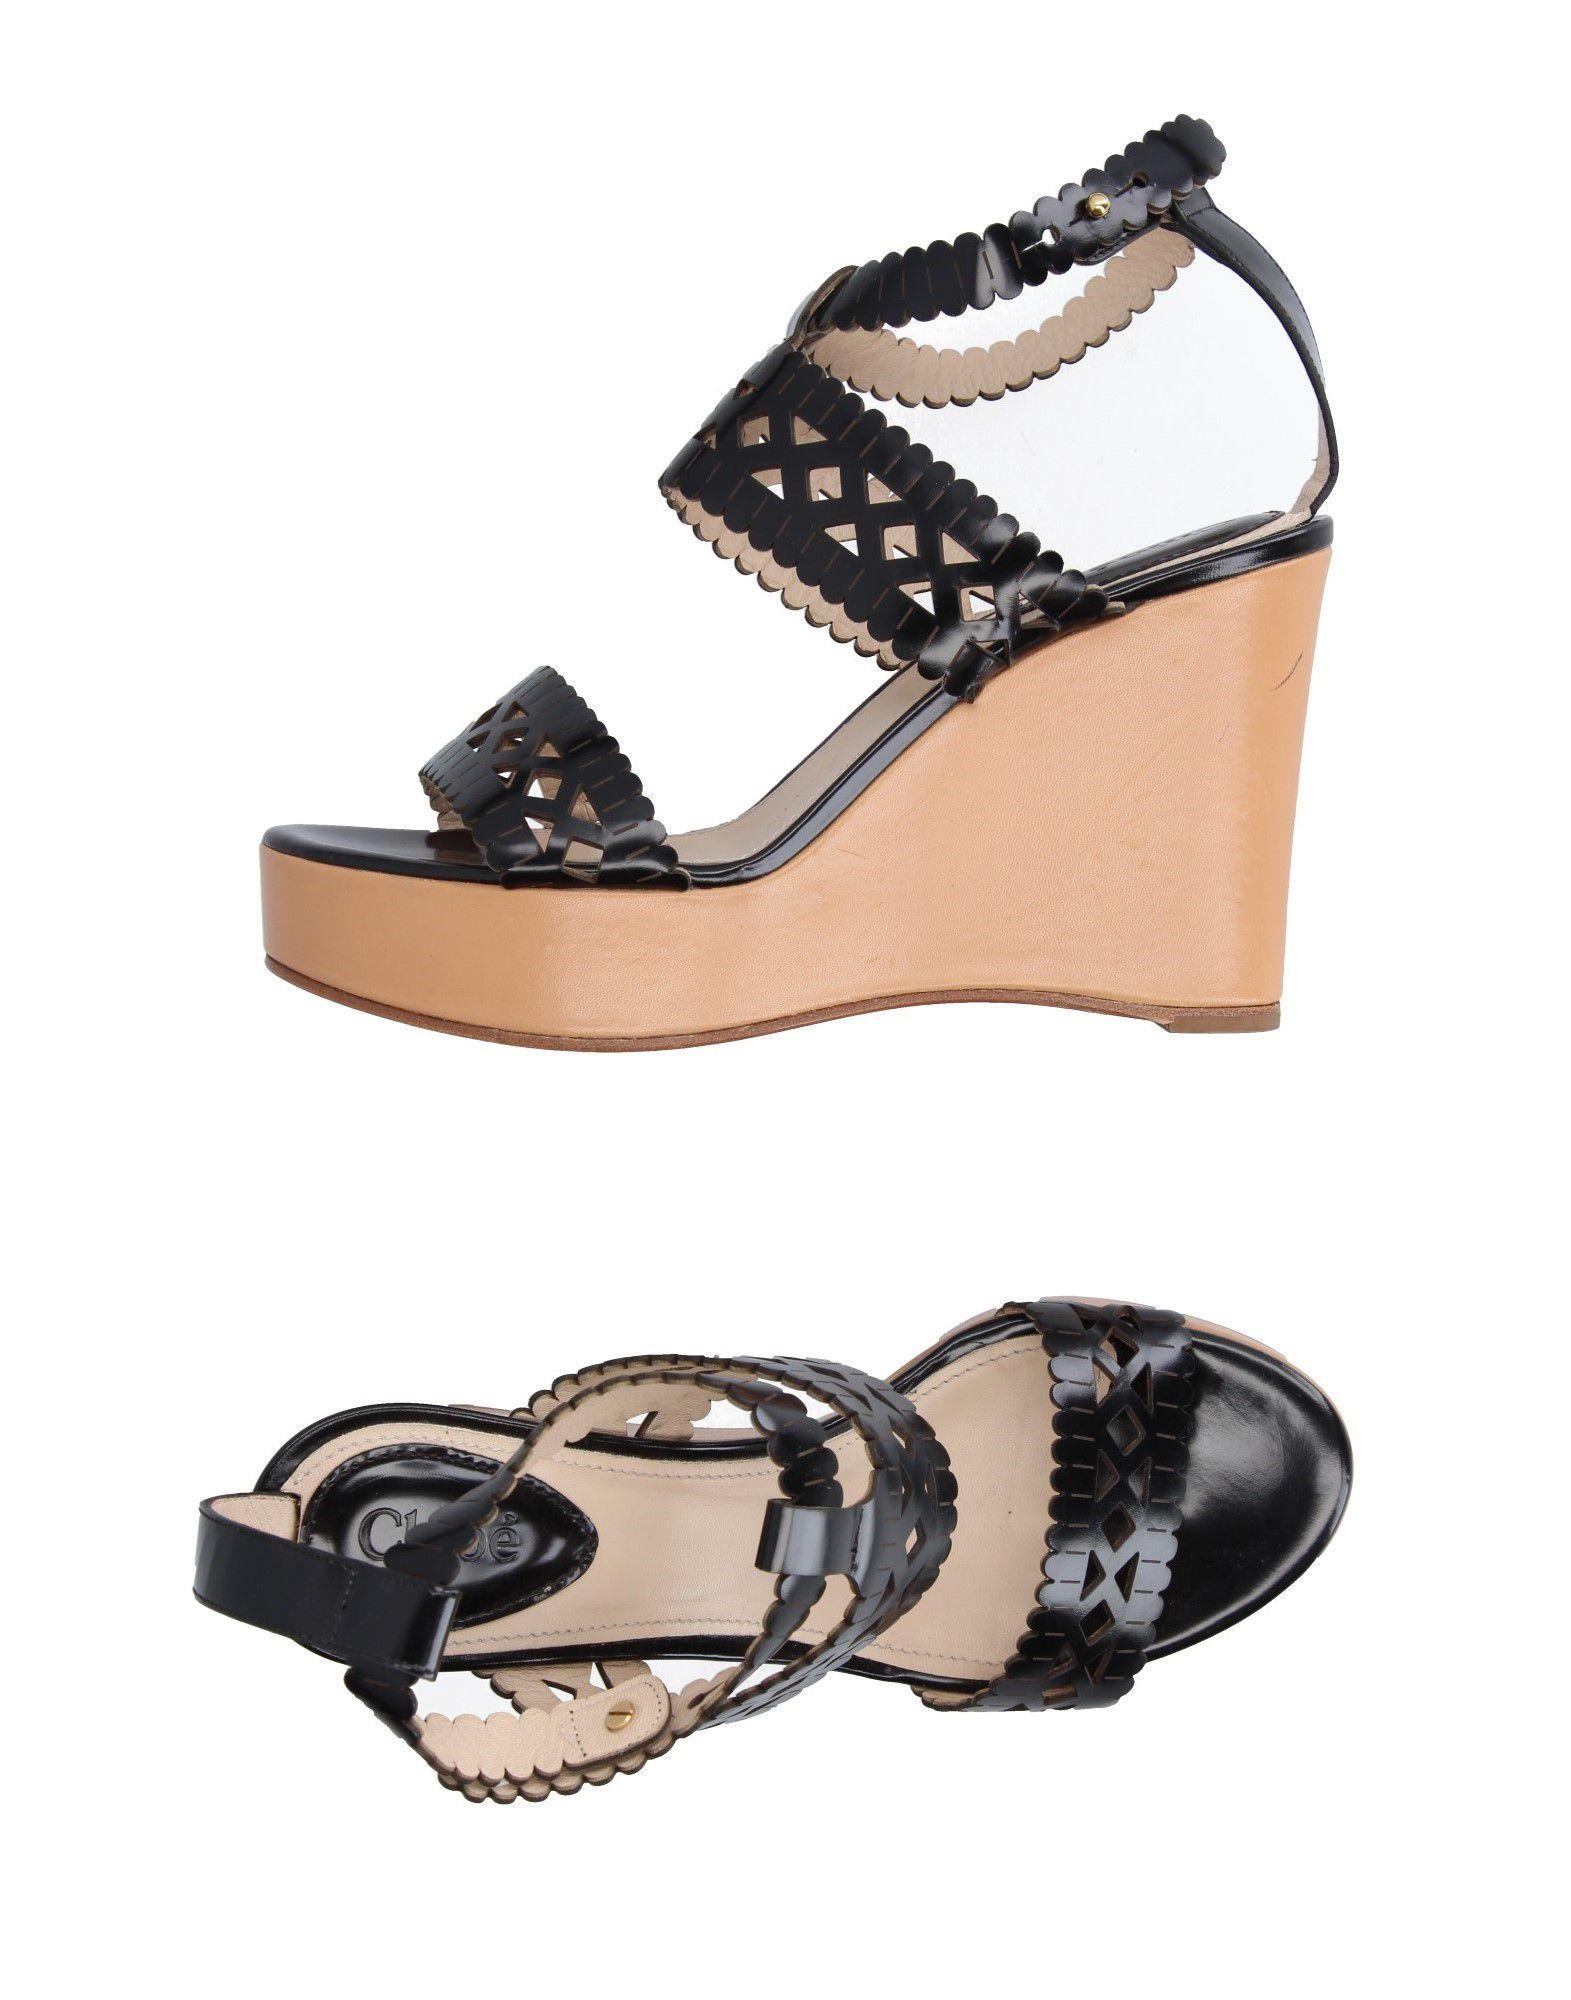 Sandali Chloé Donna - 11216712FM elegante